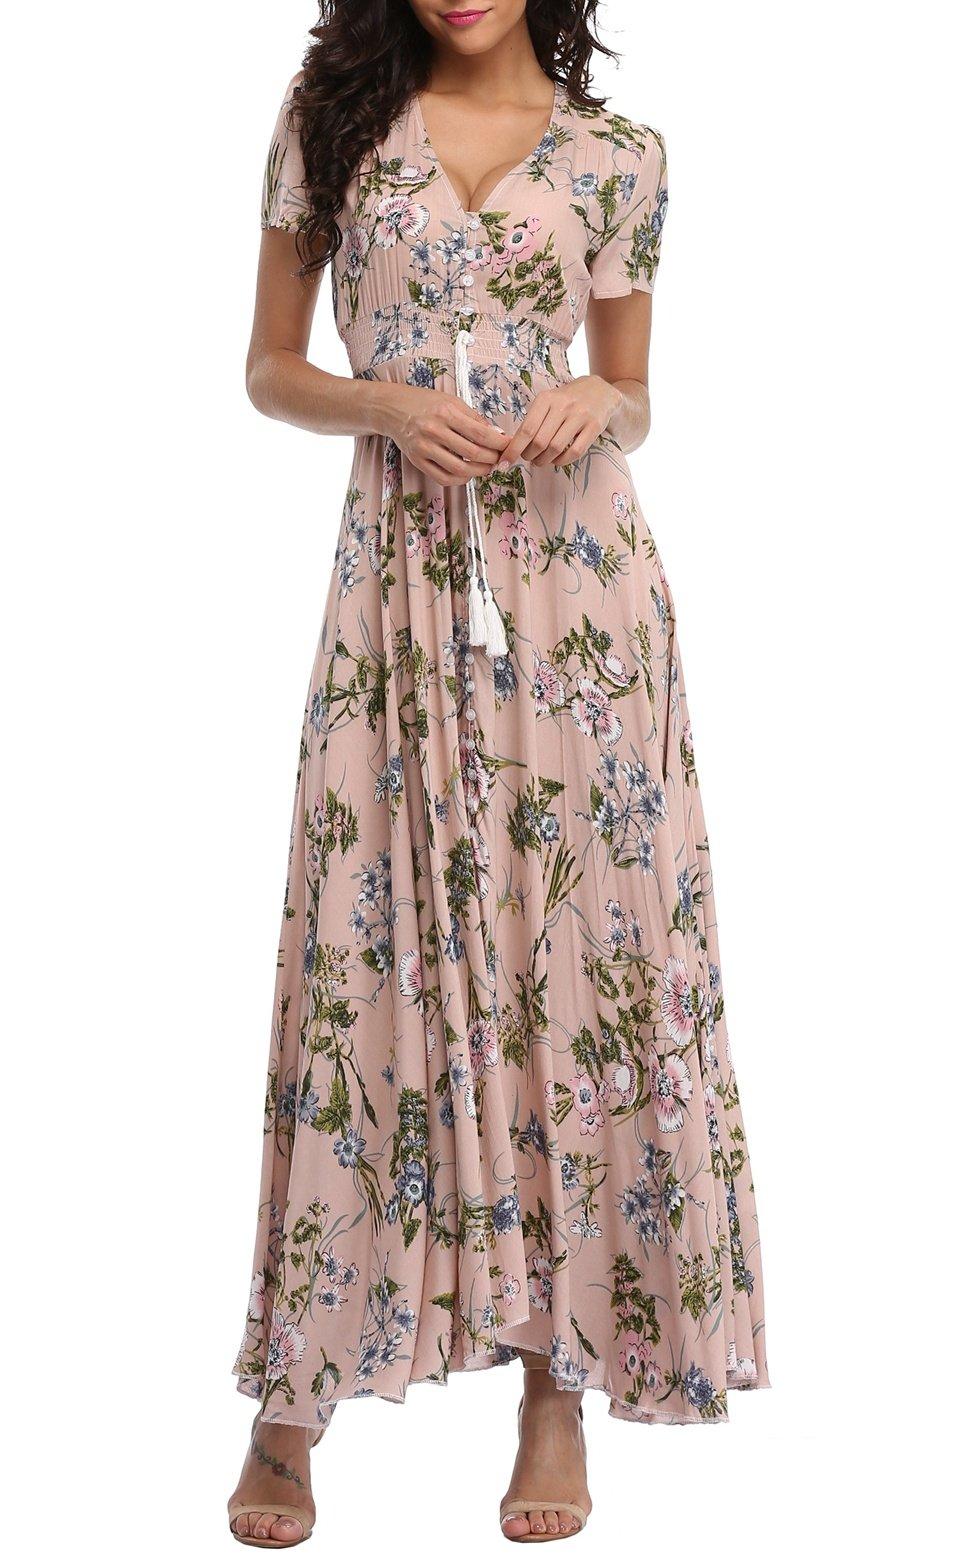 VintageClothing Women's Floral Print Maxi Dresses Boho Button Up Split Beach Party Dress,Pale Dogwood,Large by VintageClothing (Image #2)